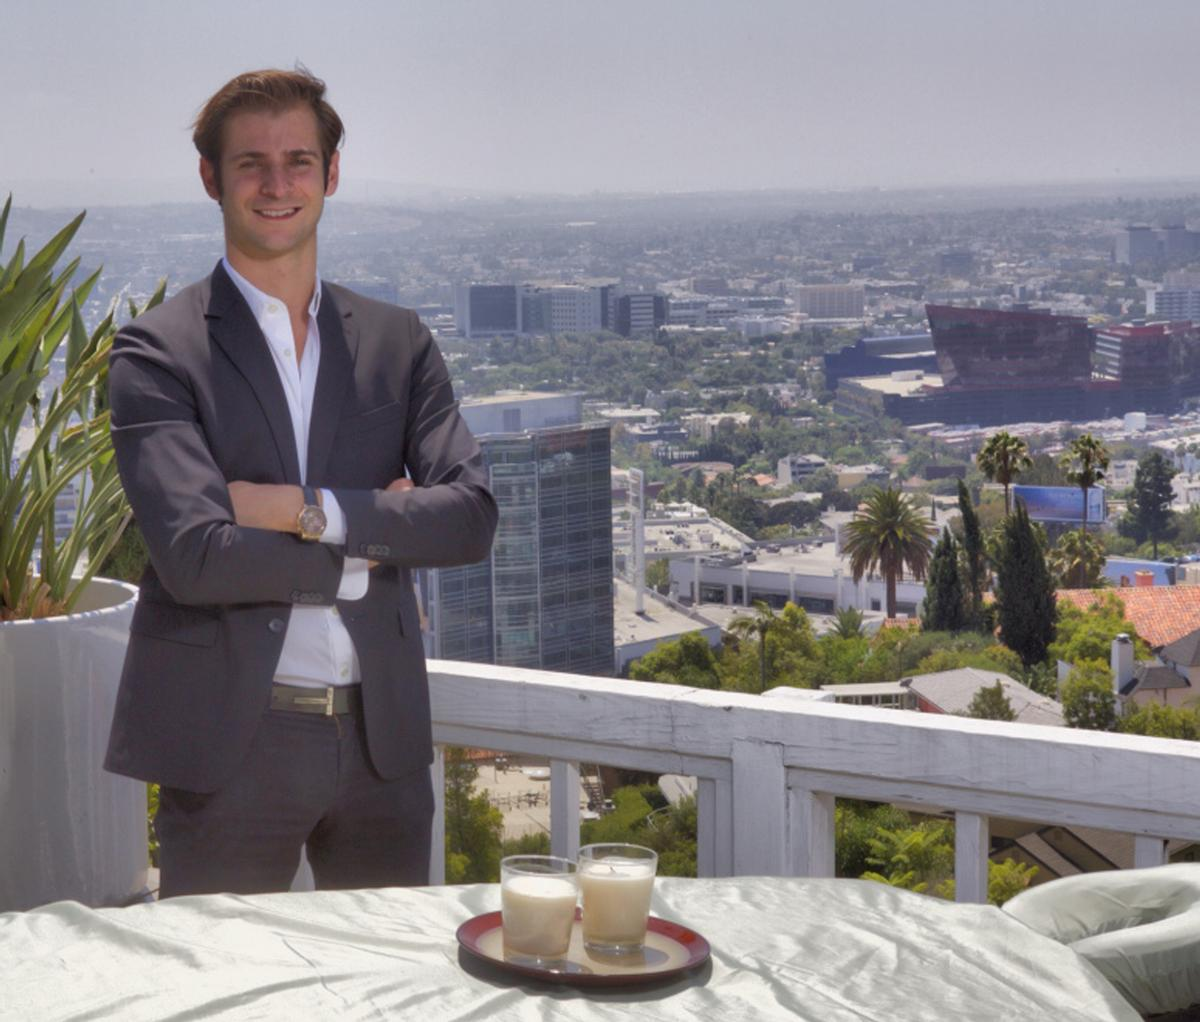 Soothe founder Merlin Kauffman